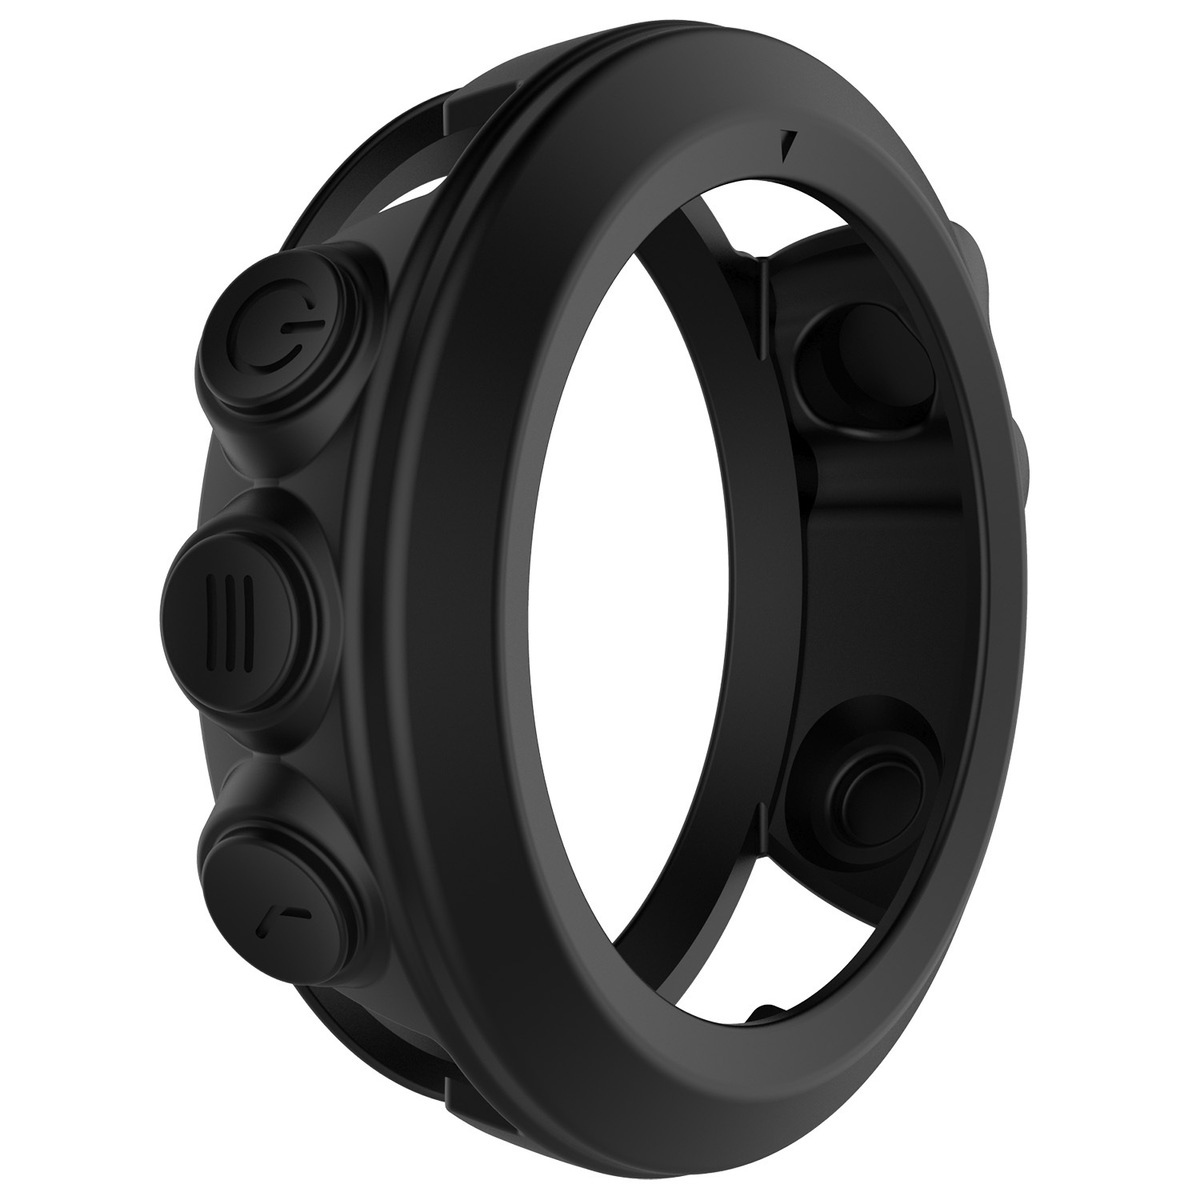 Soft Silicone Protective Case Protector Sleeve for Garmin Fenix 3 HR/Fenix 3/Fenix 3 Sapphire/Quatix 3/Tactix Bravo Band Cover garmin fenix 5 sapphire black black band